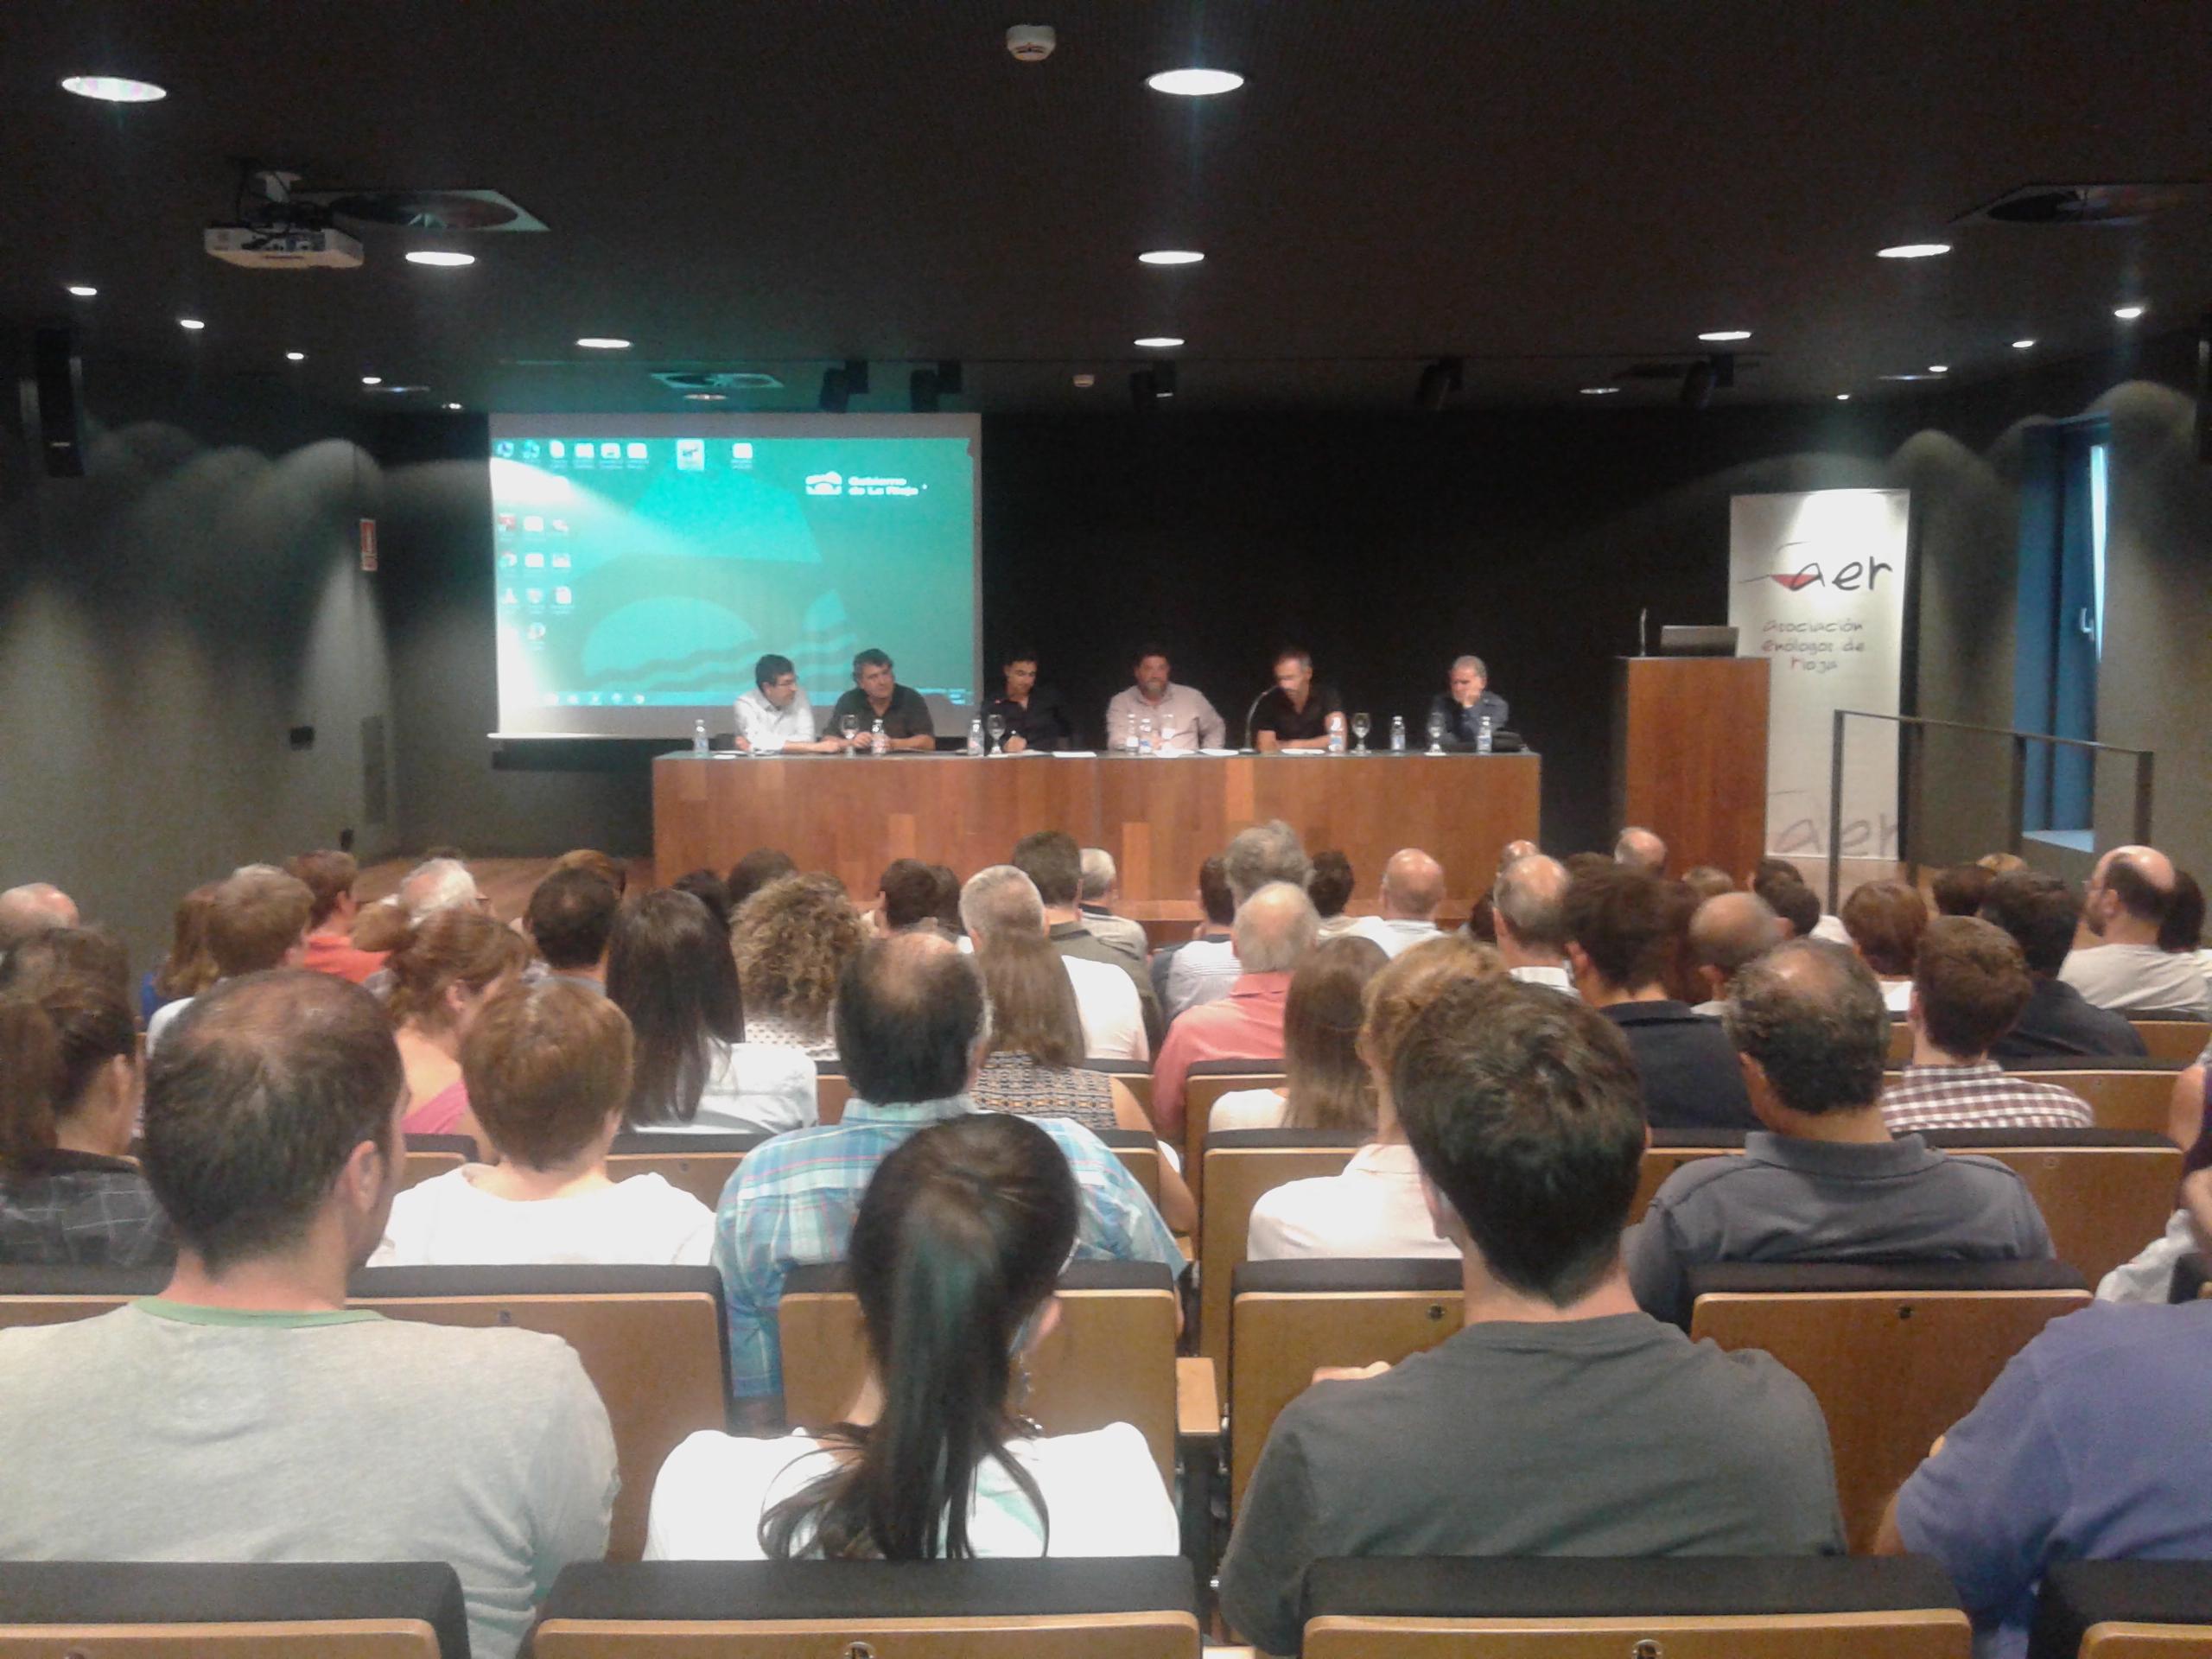 Foto Ponentes Jornada Blancos AER 03.09.15